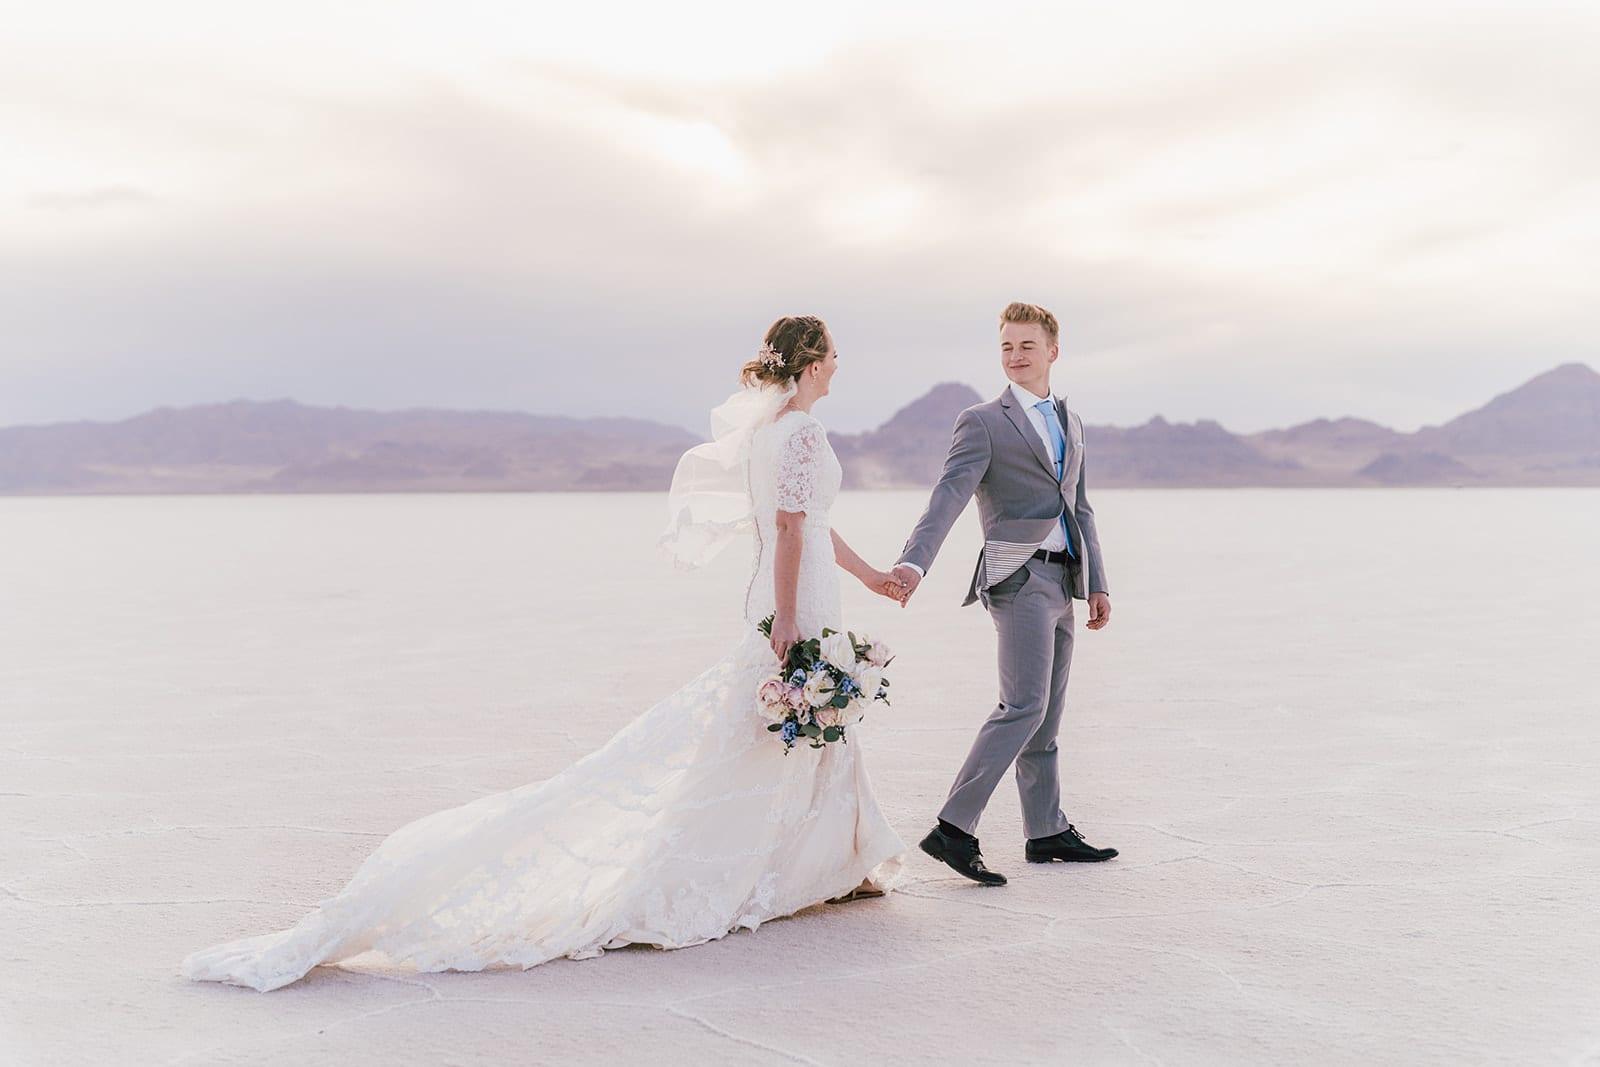 Love Brittny wedding photography salt flats